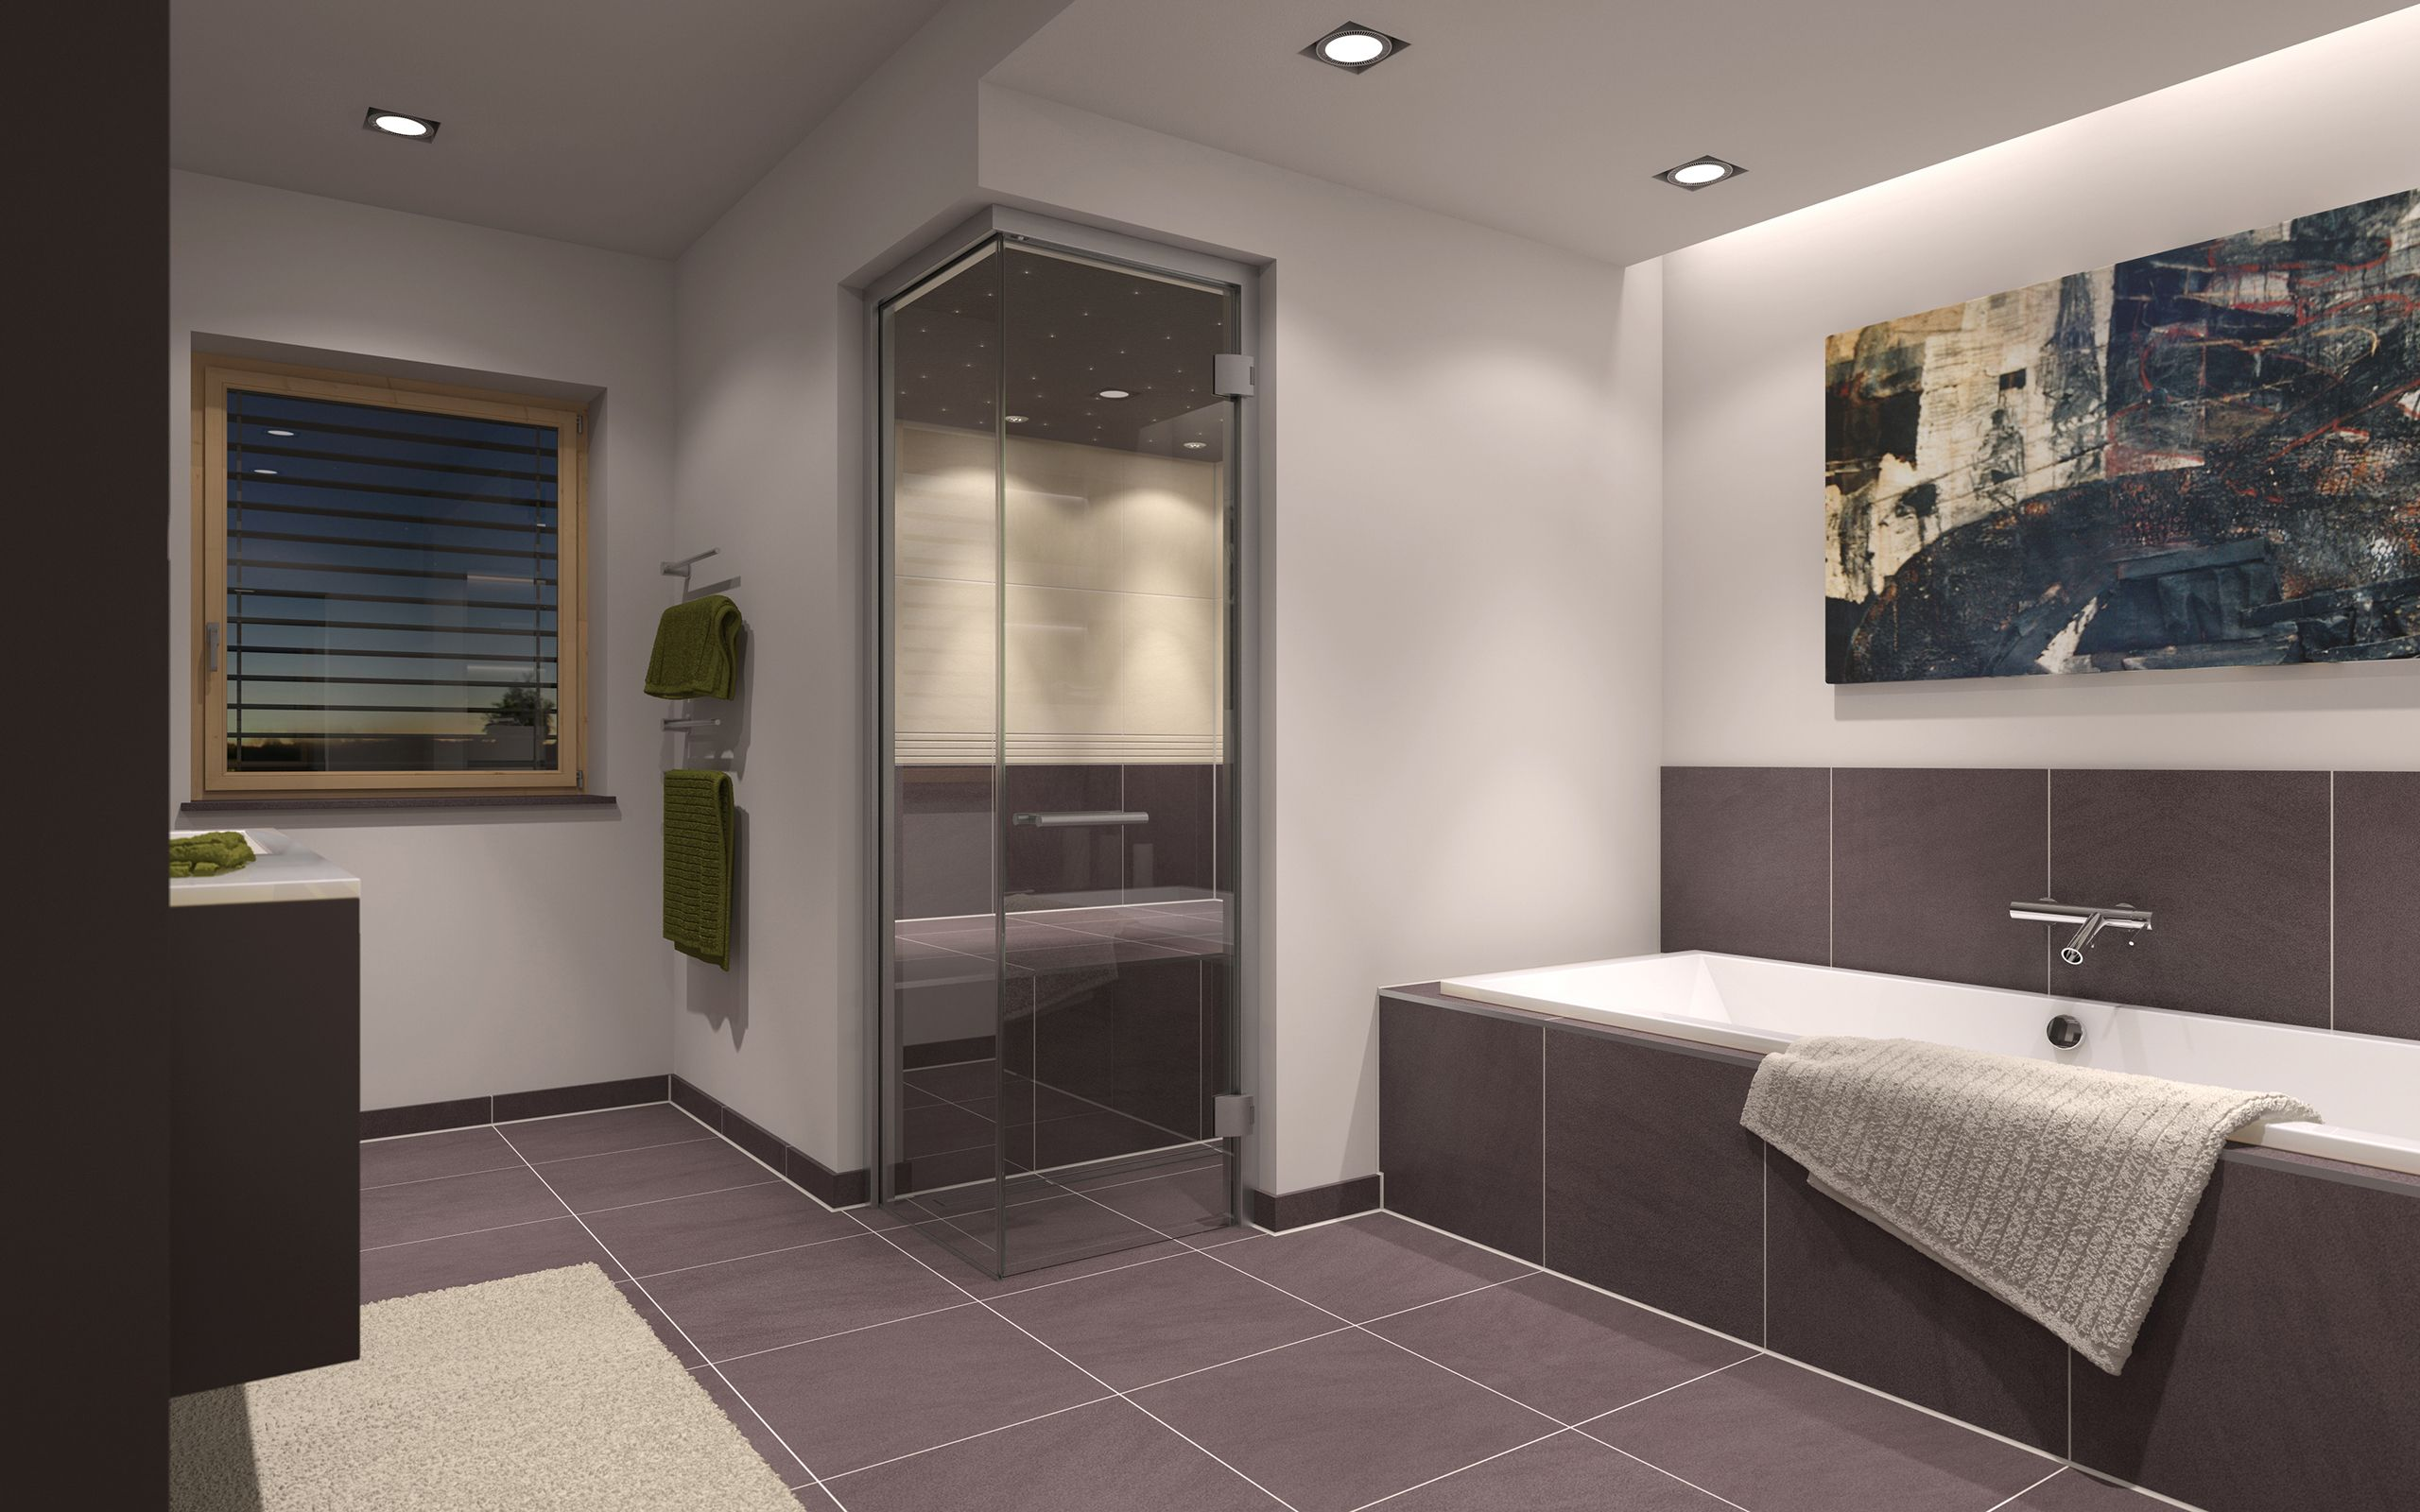 Ideen Fur Badezimmer Mit Sauna Kreative Wandgestaltung Badezimmer